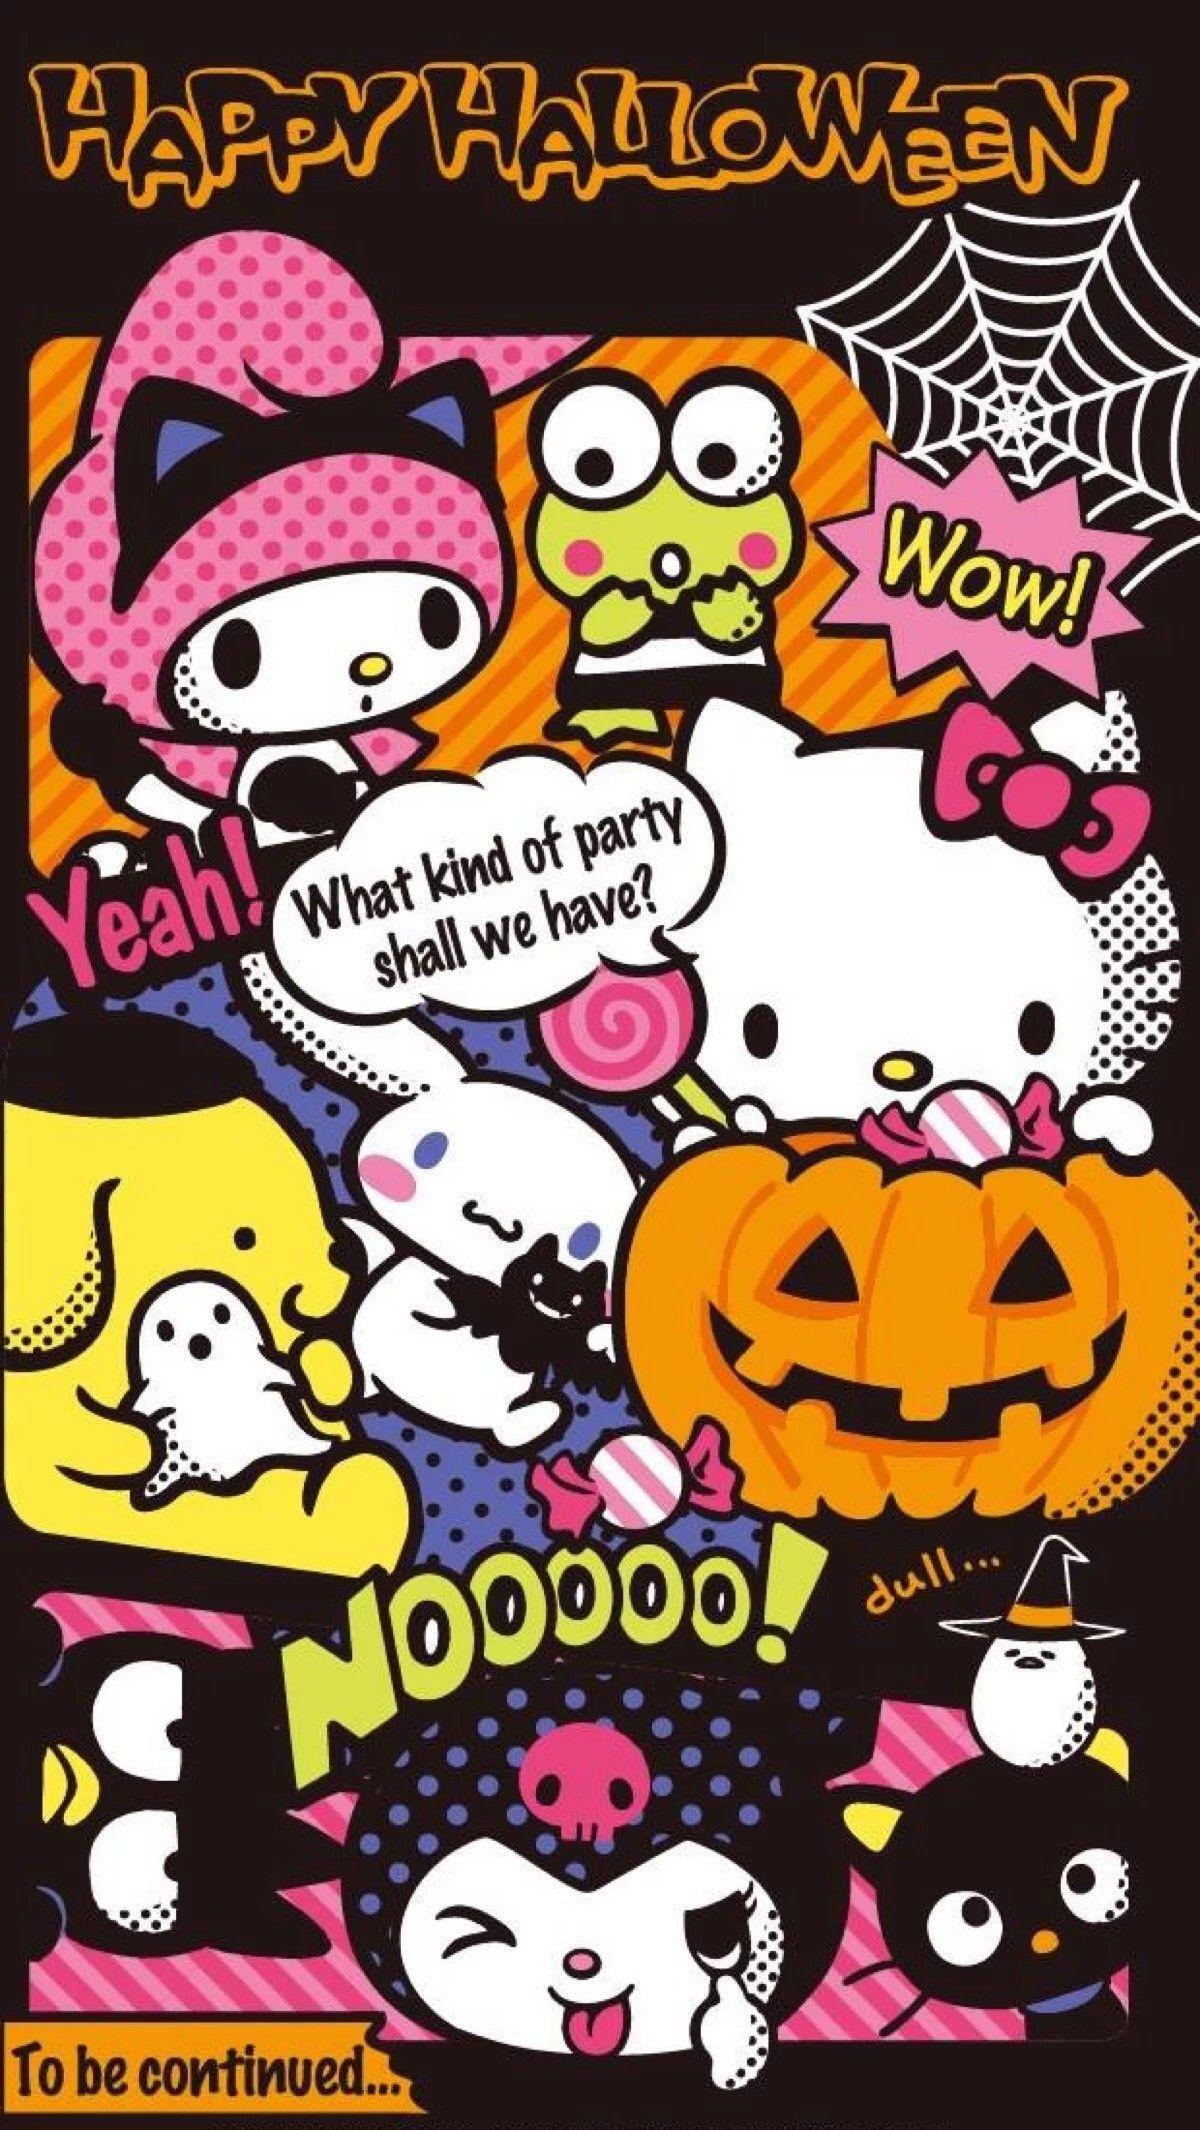 Inspirational Zombie Hello Kitty Wallpaper in 2020 Hello